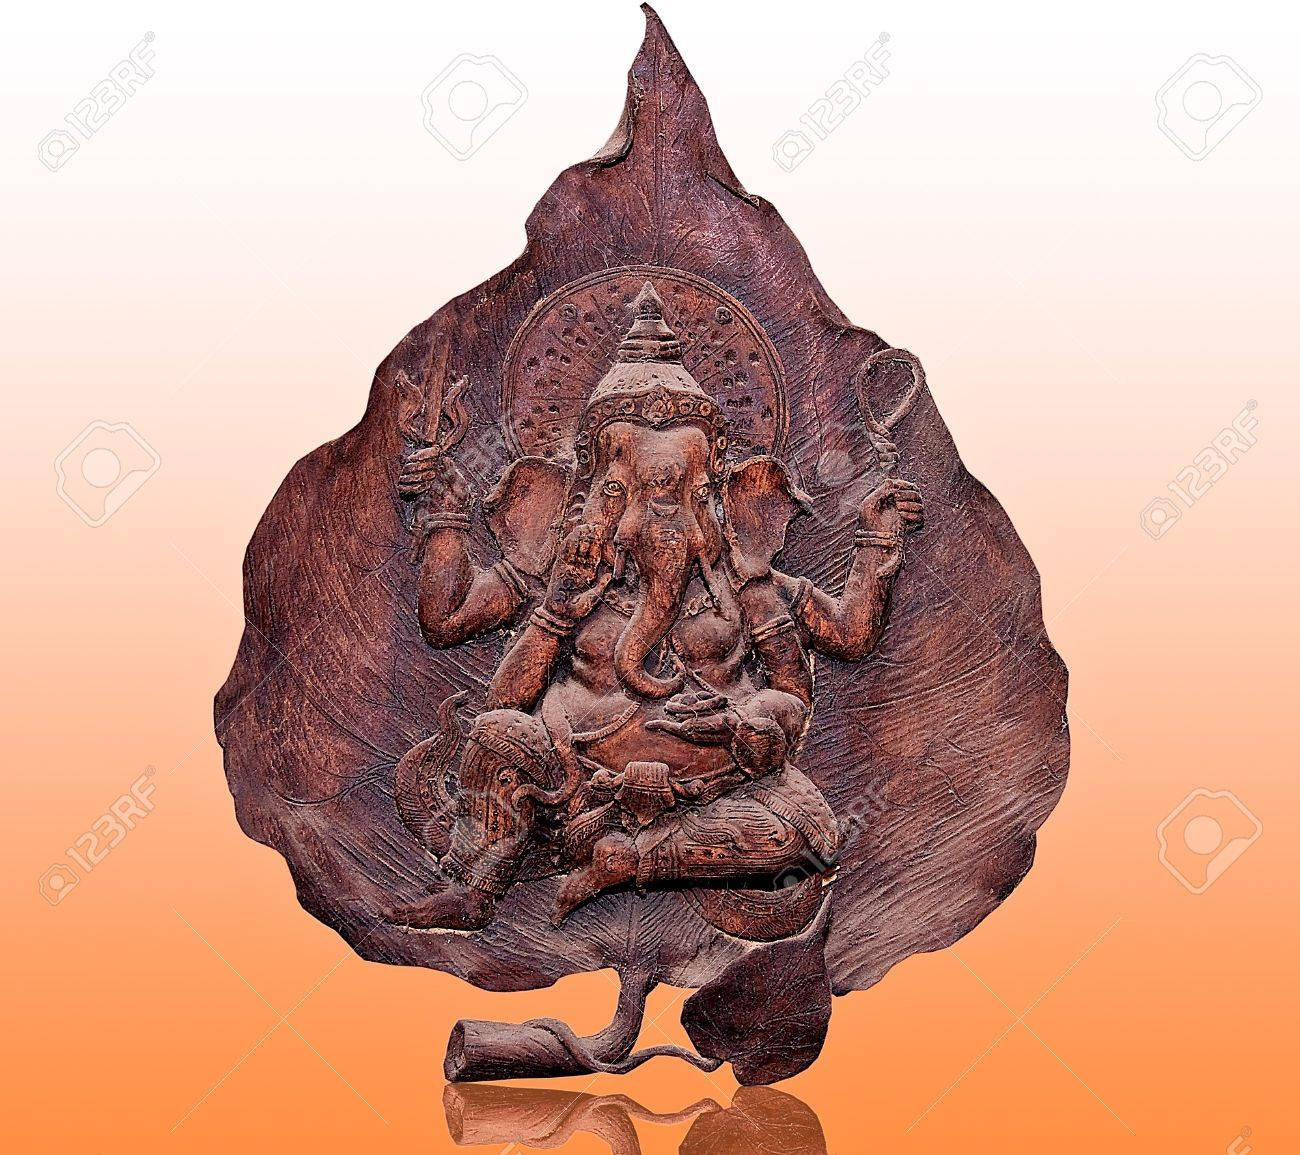 The Carving wood of ganesha on reflect background Stock Photo - 13776413